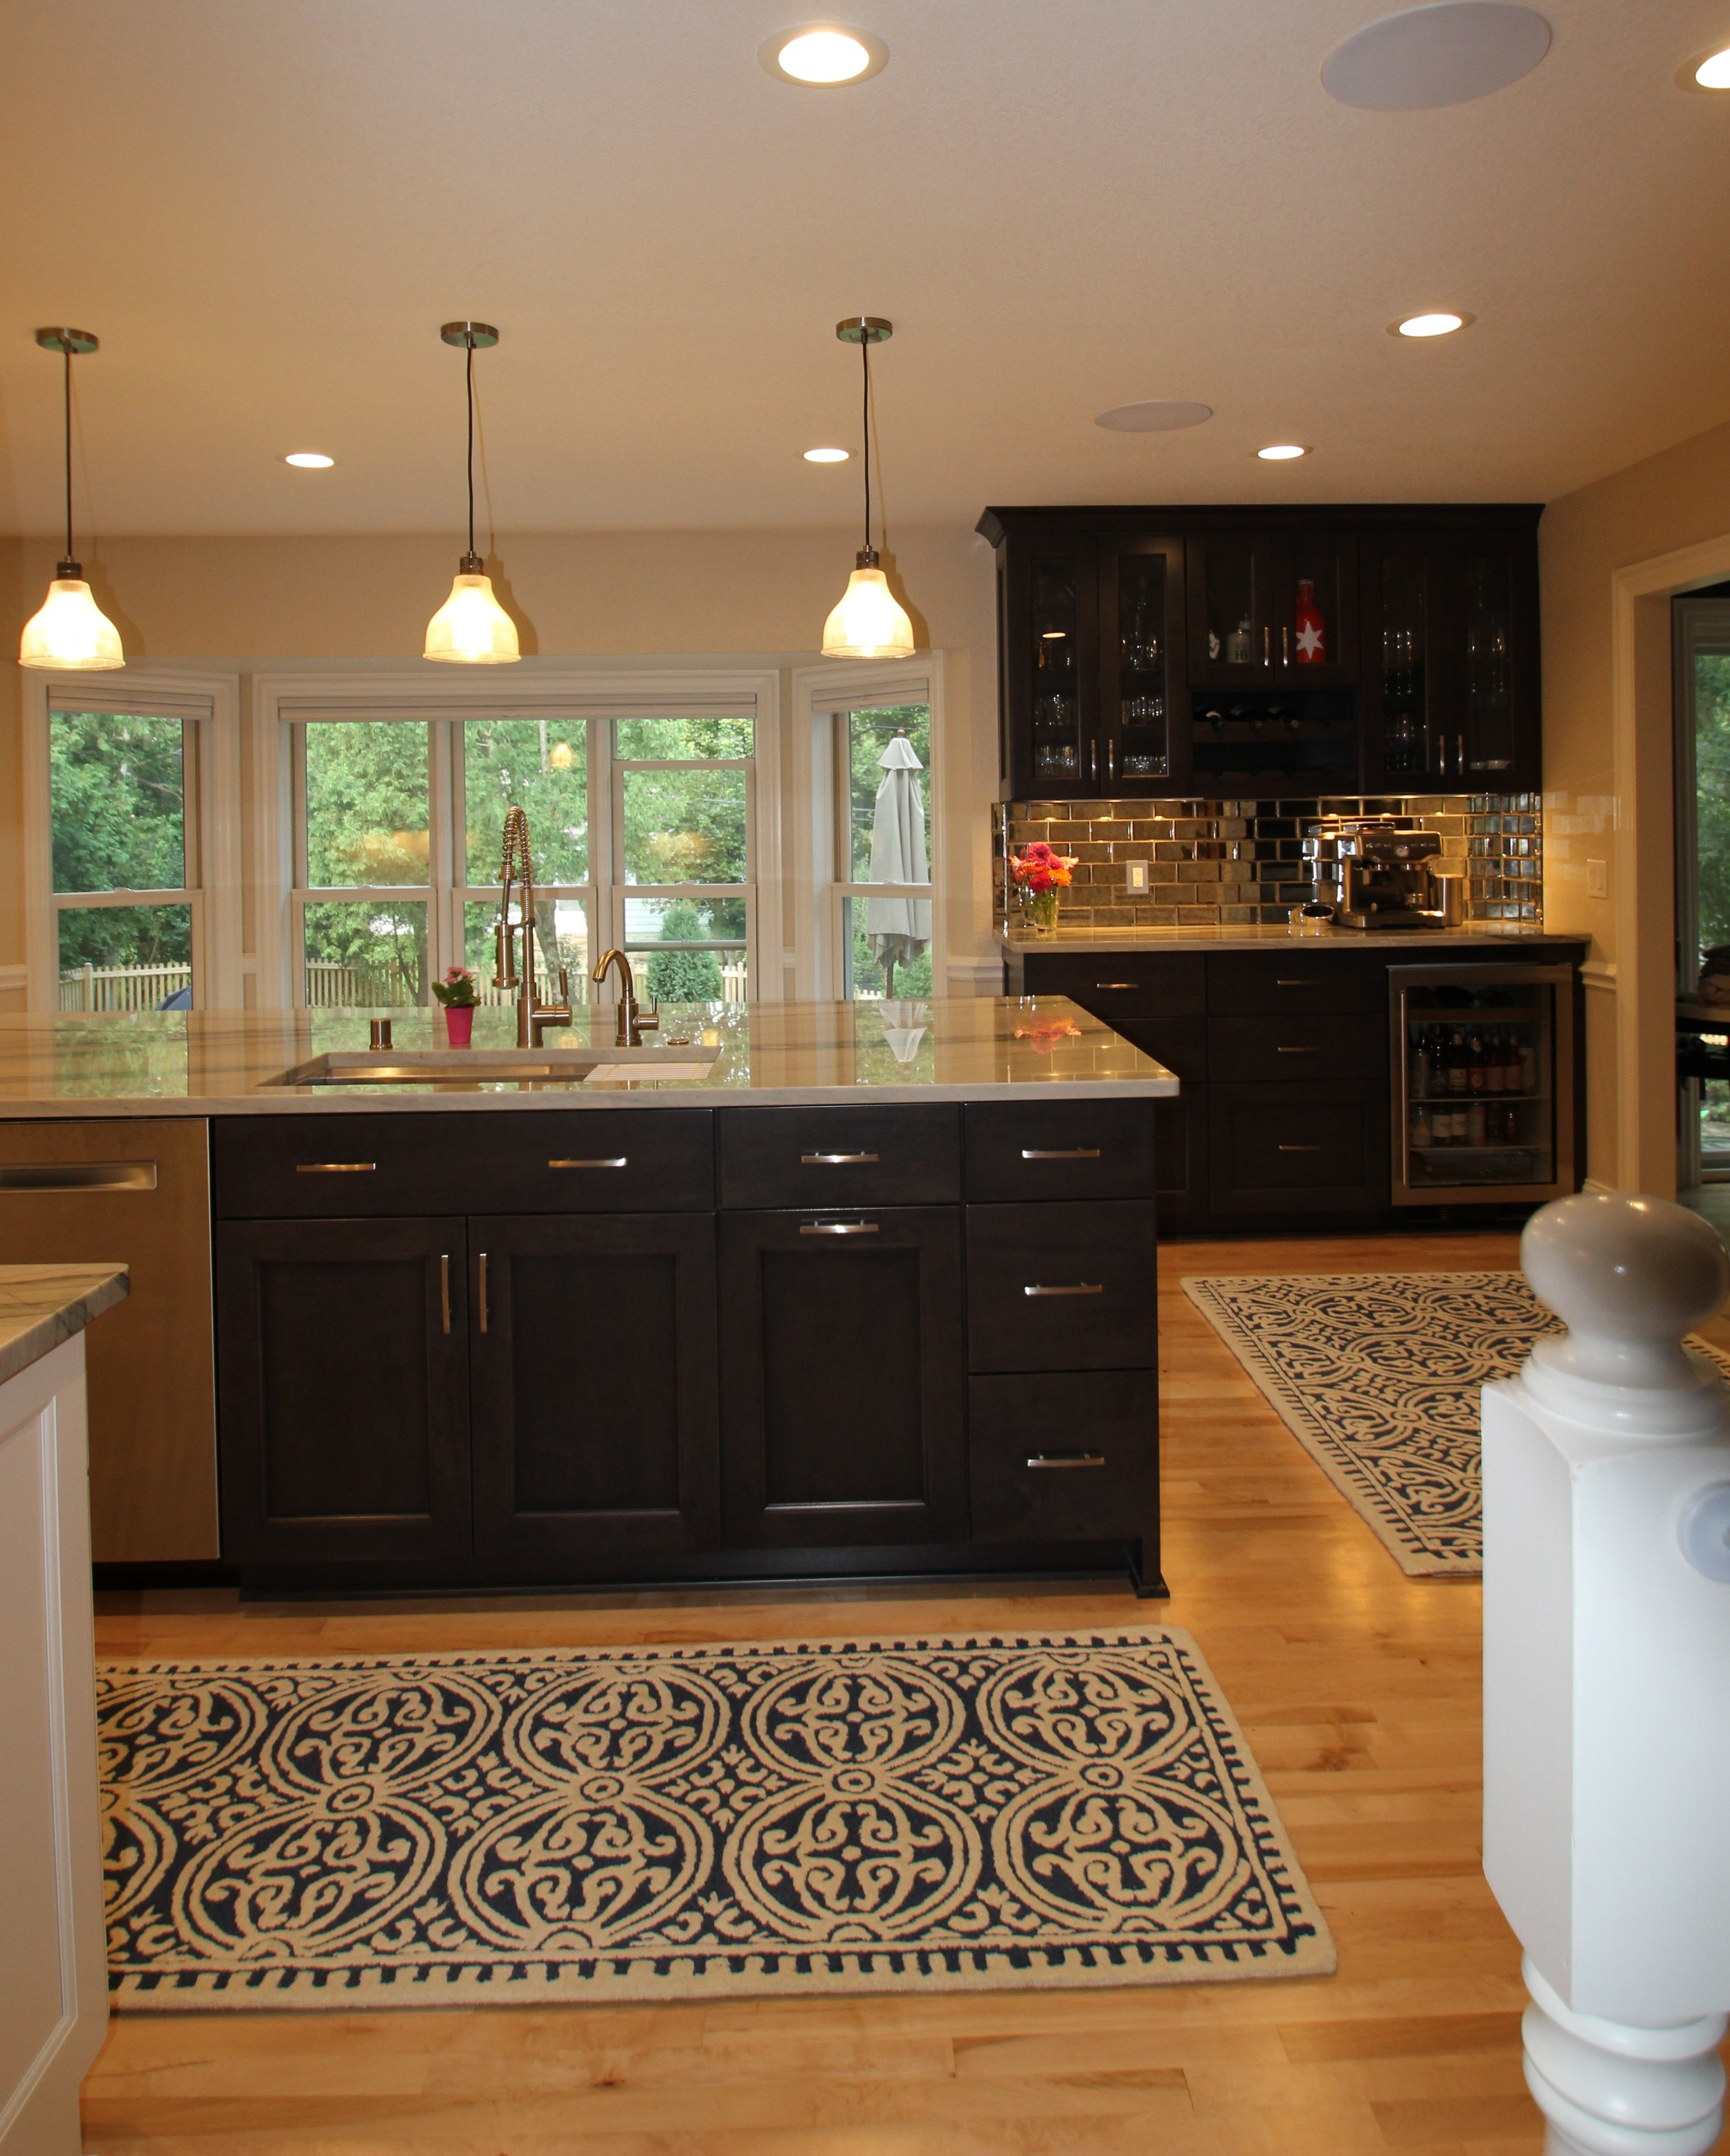 Elm Grove Kitchen Redesign - Custom Remodel